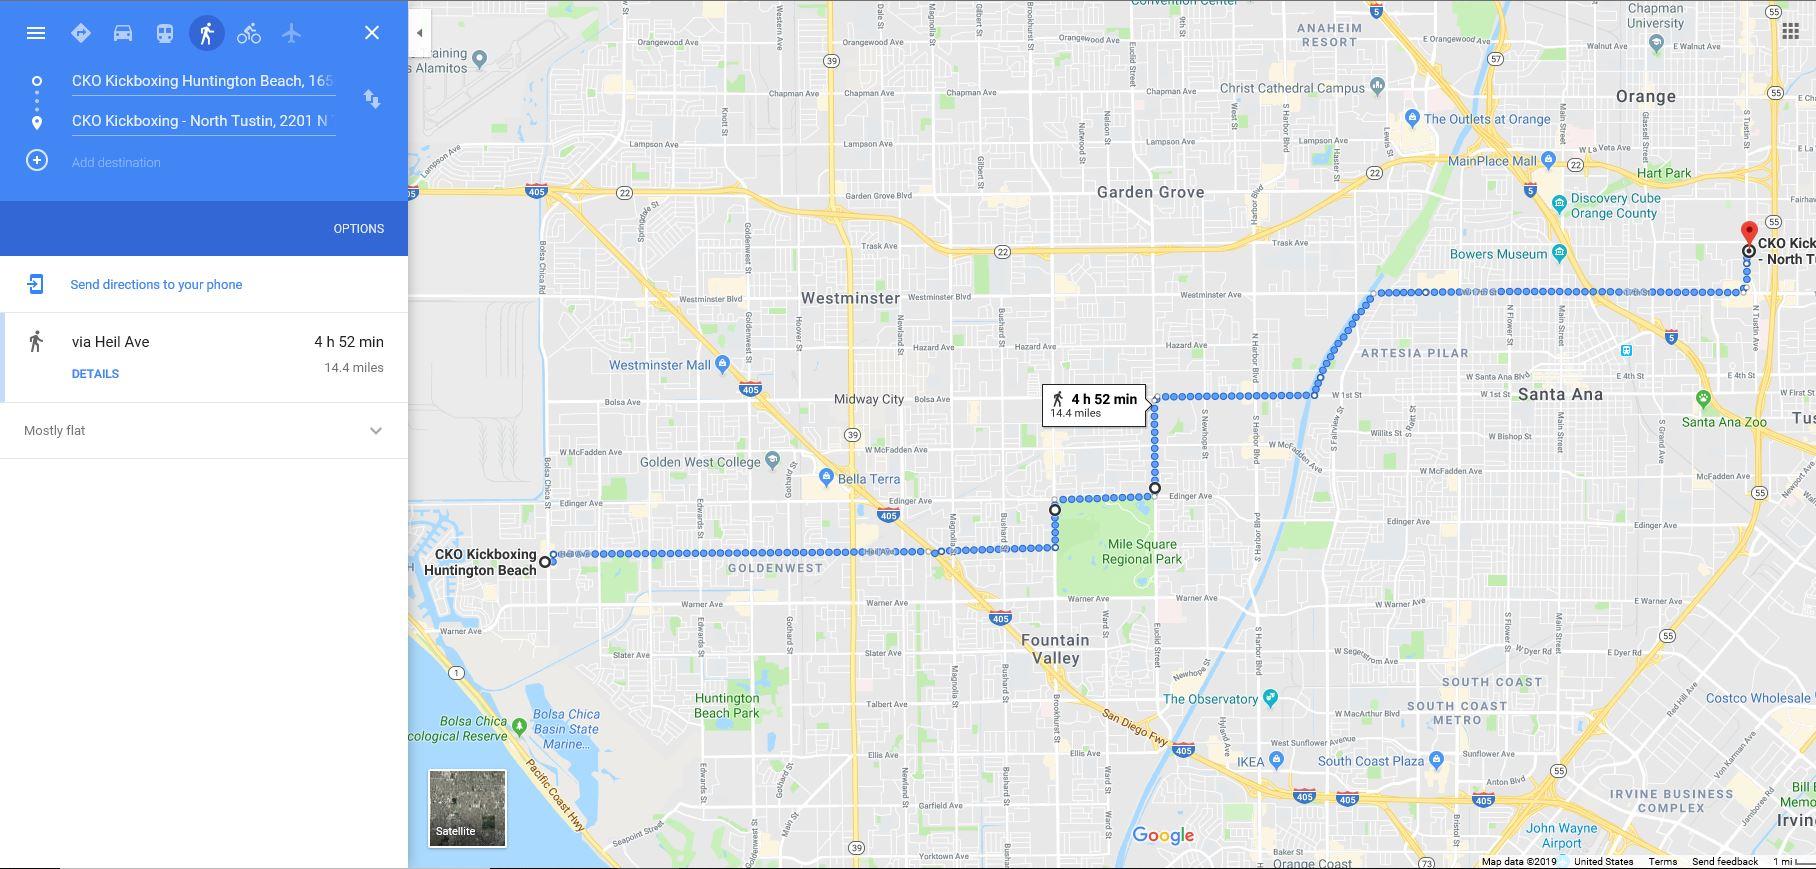 14.5 Mile Run - checkpoints7am CKO Huntington Beach -run930am CKO North Tustin (interview)